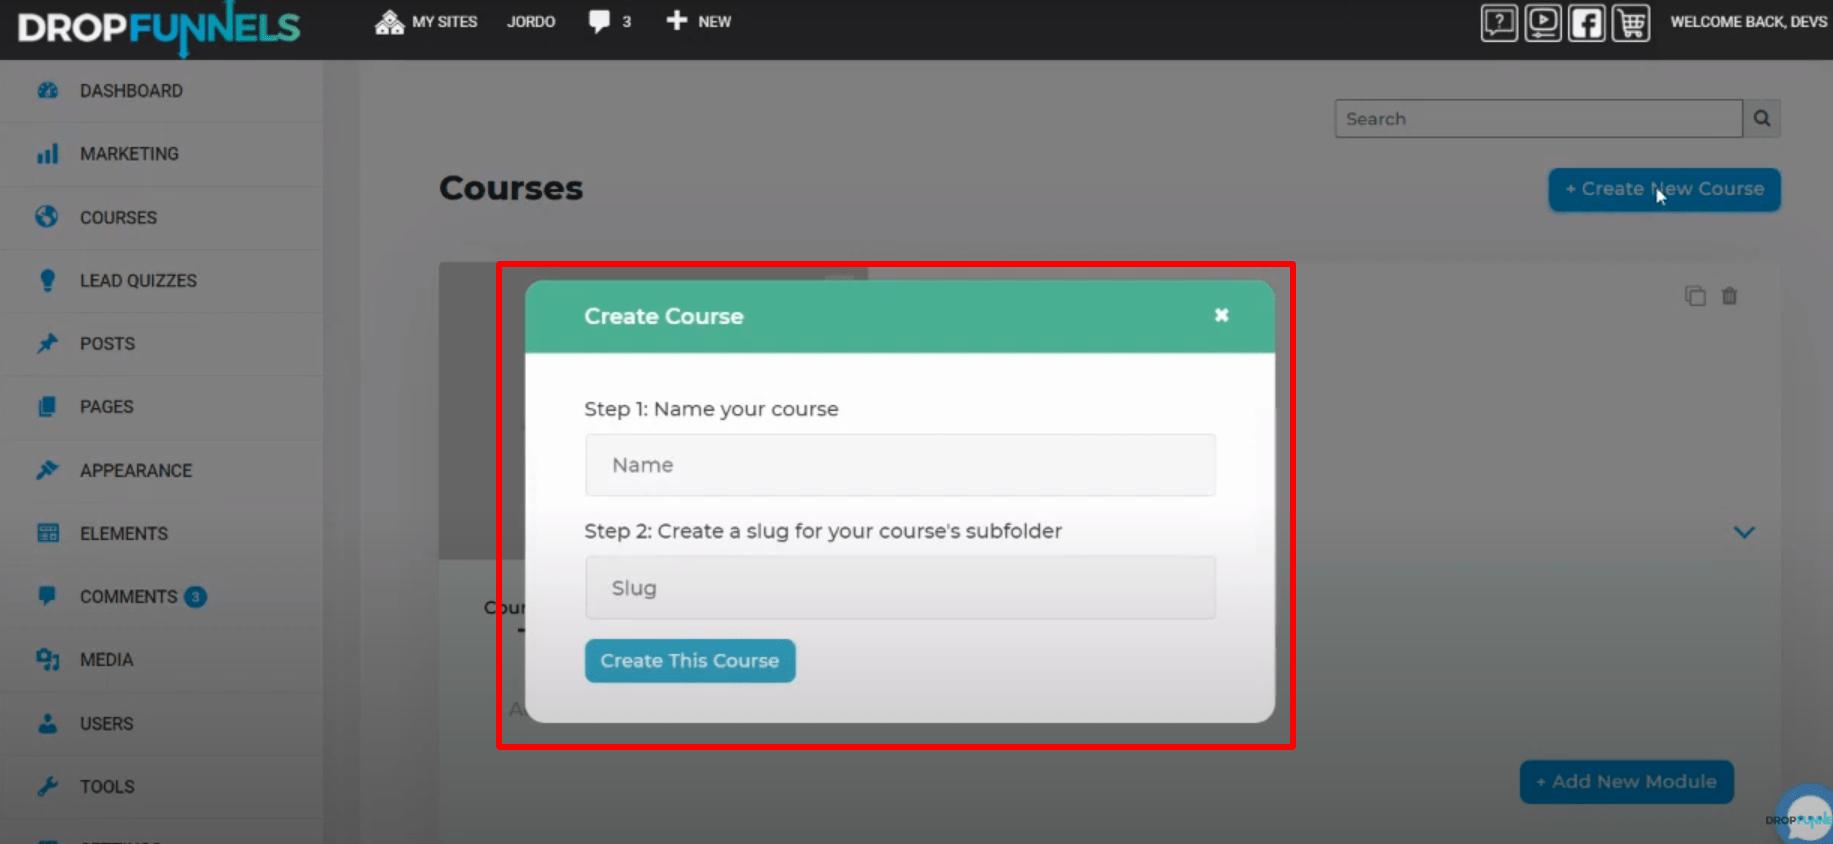 DropFunnels course creation